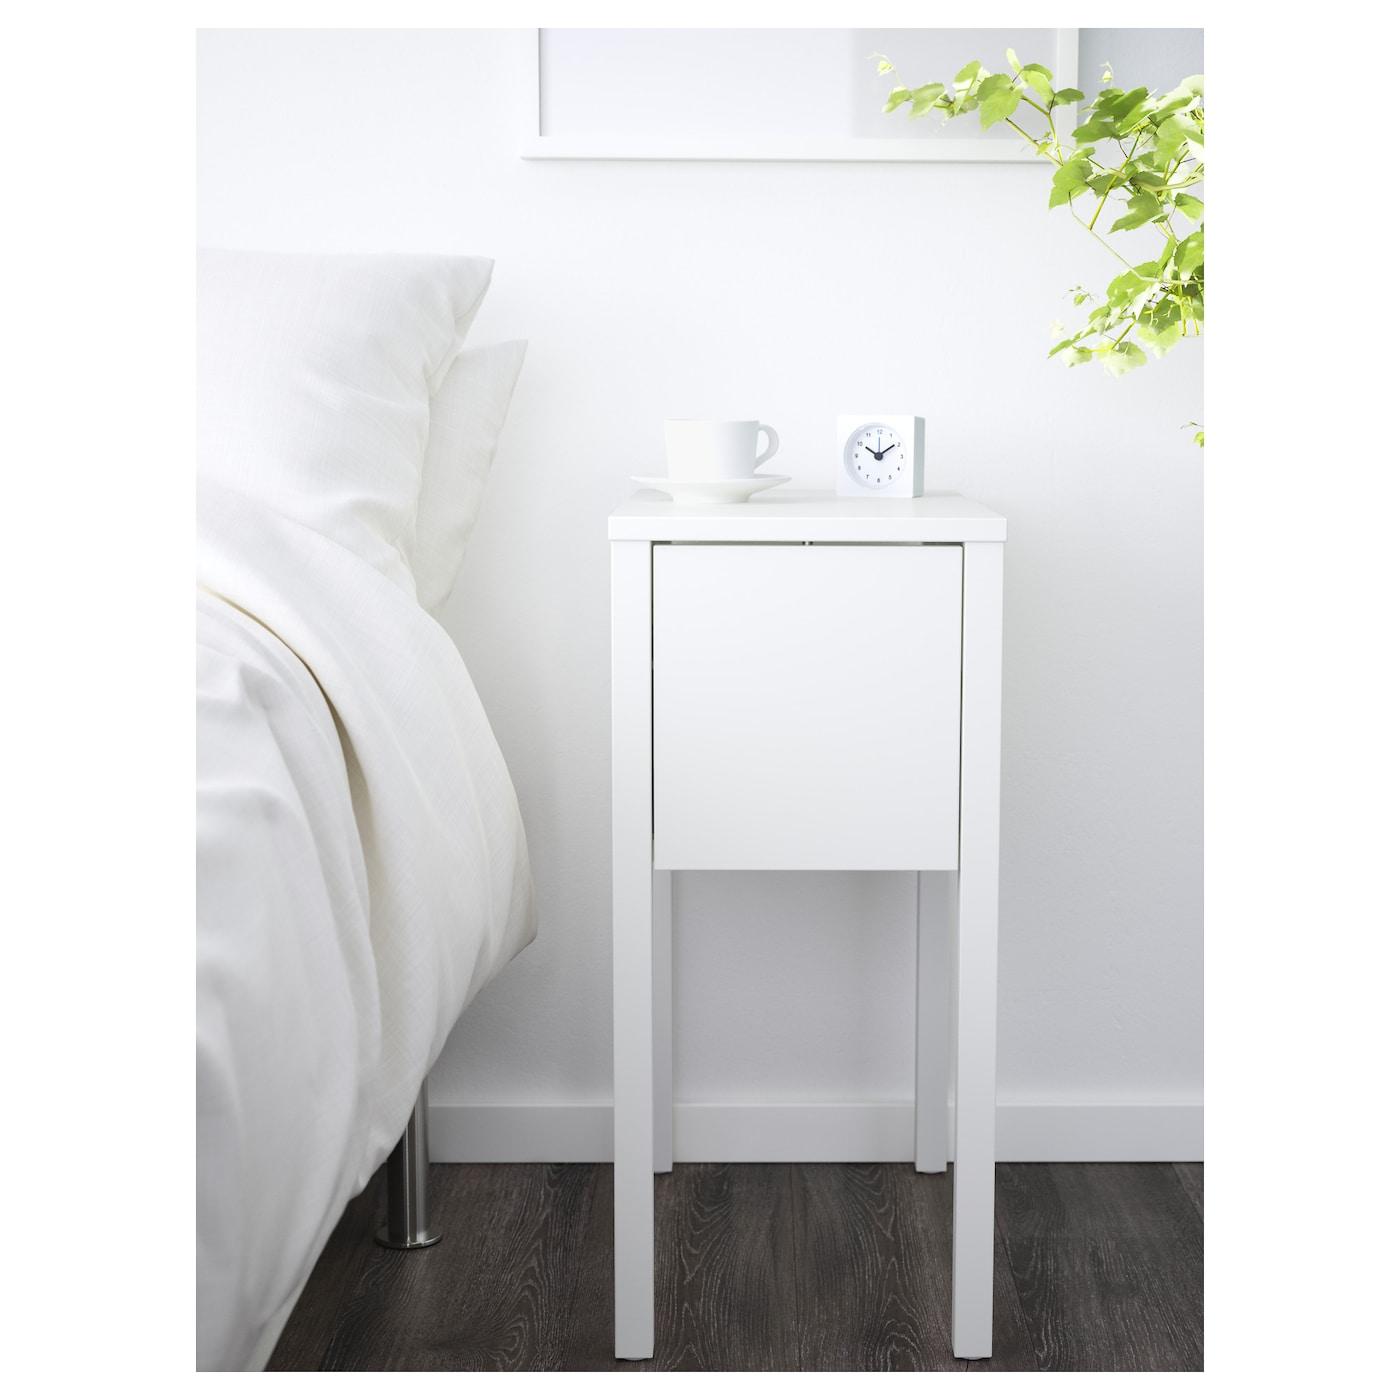 NORDLI Bedside table White 30x50 cm IKEA